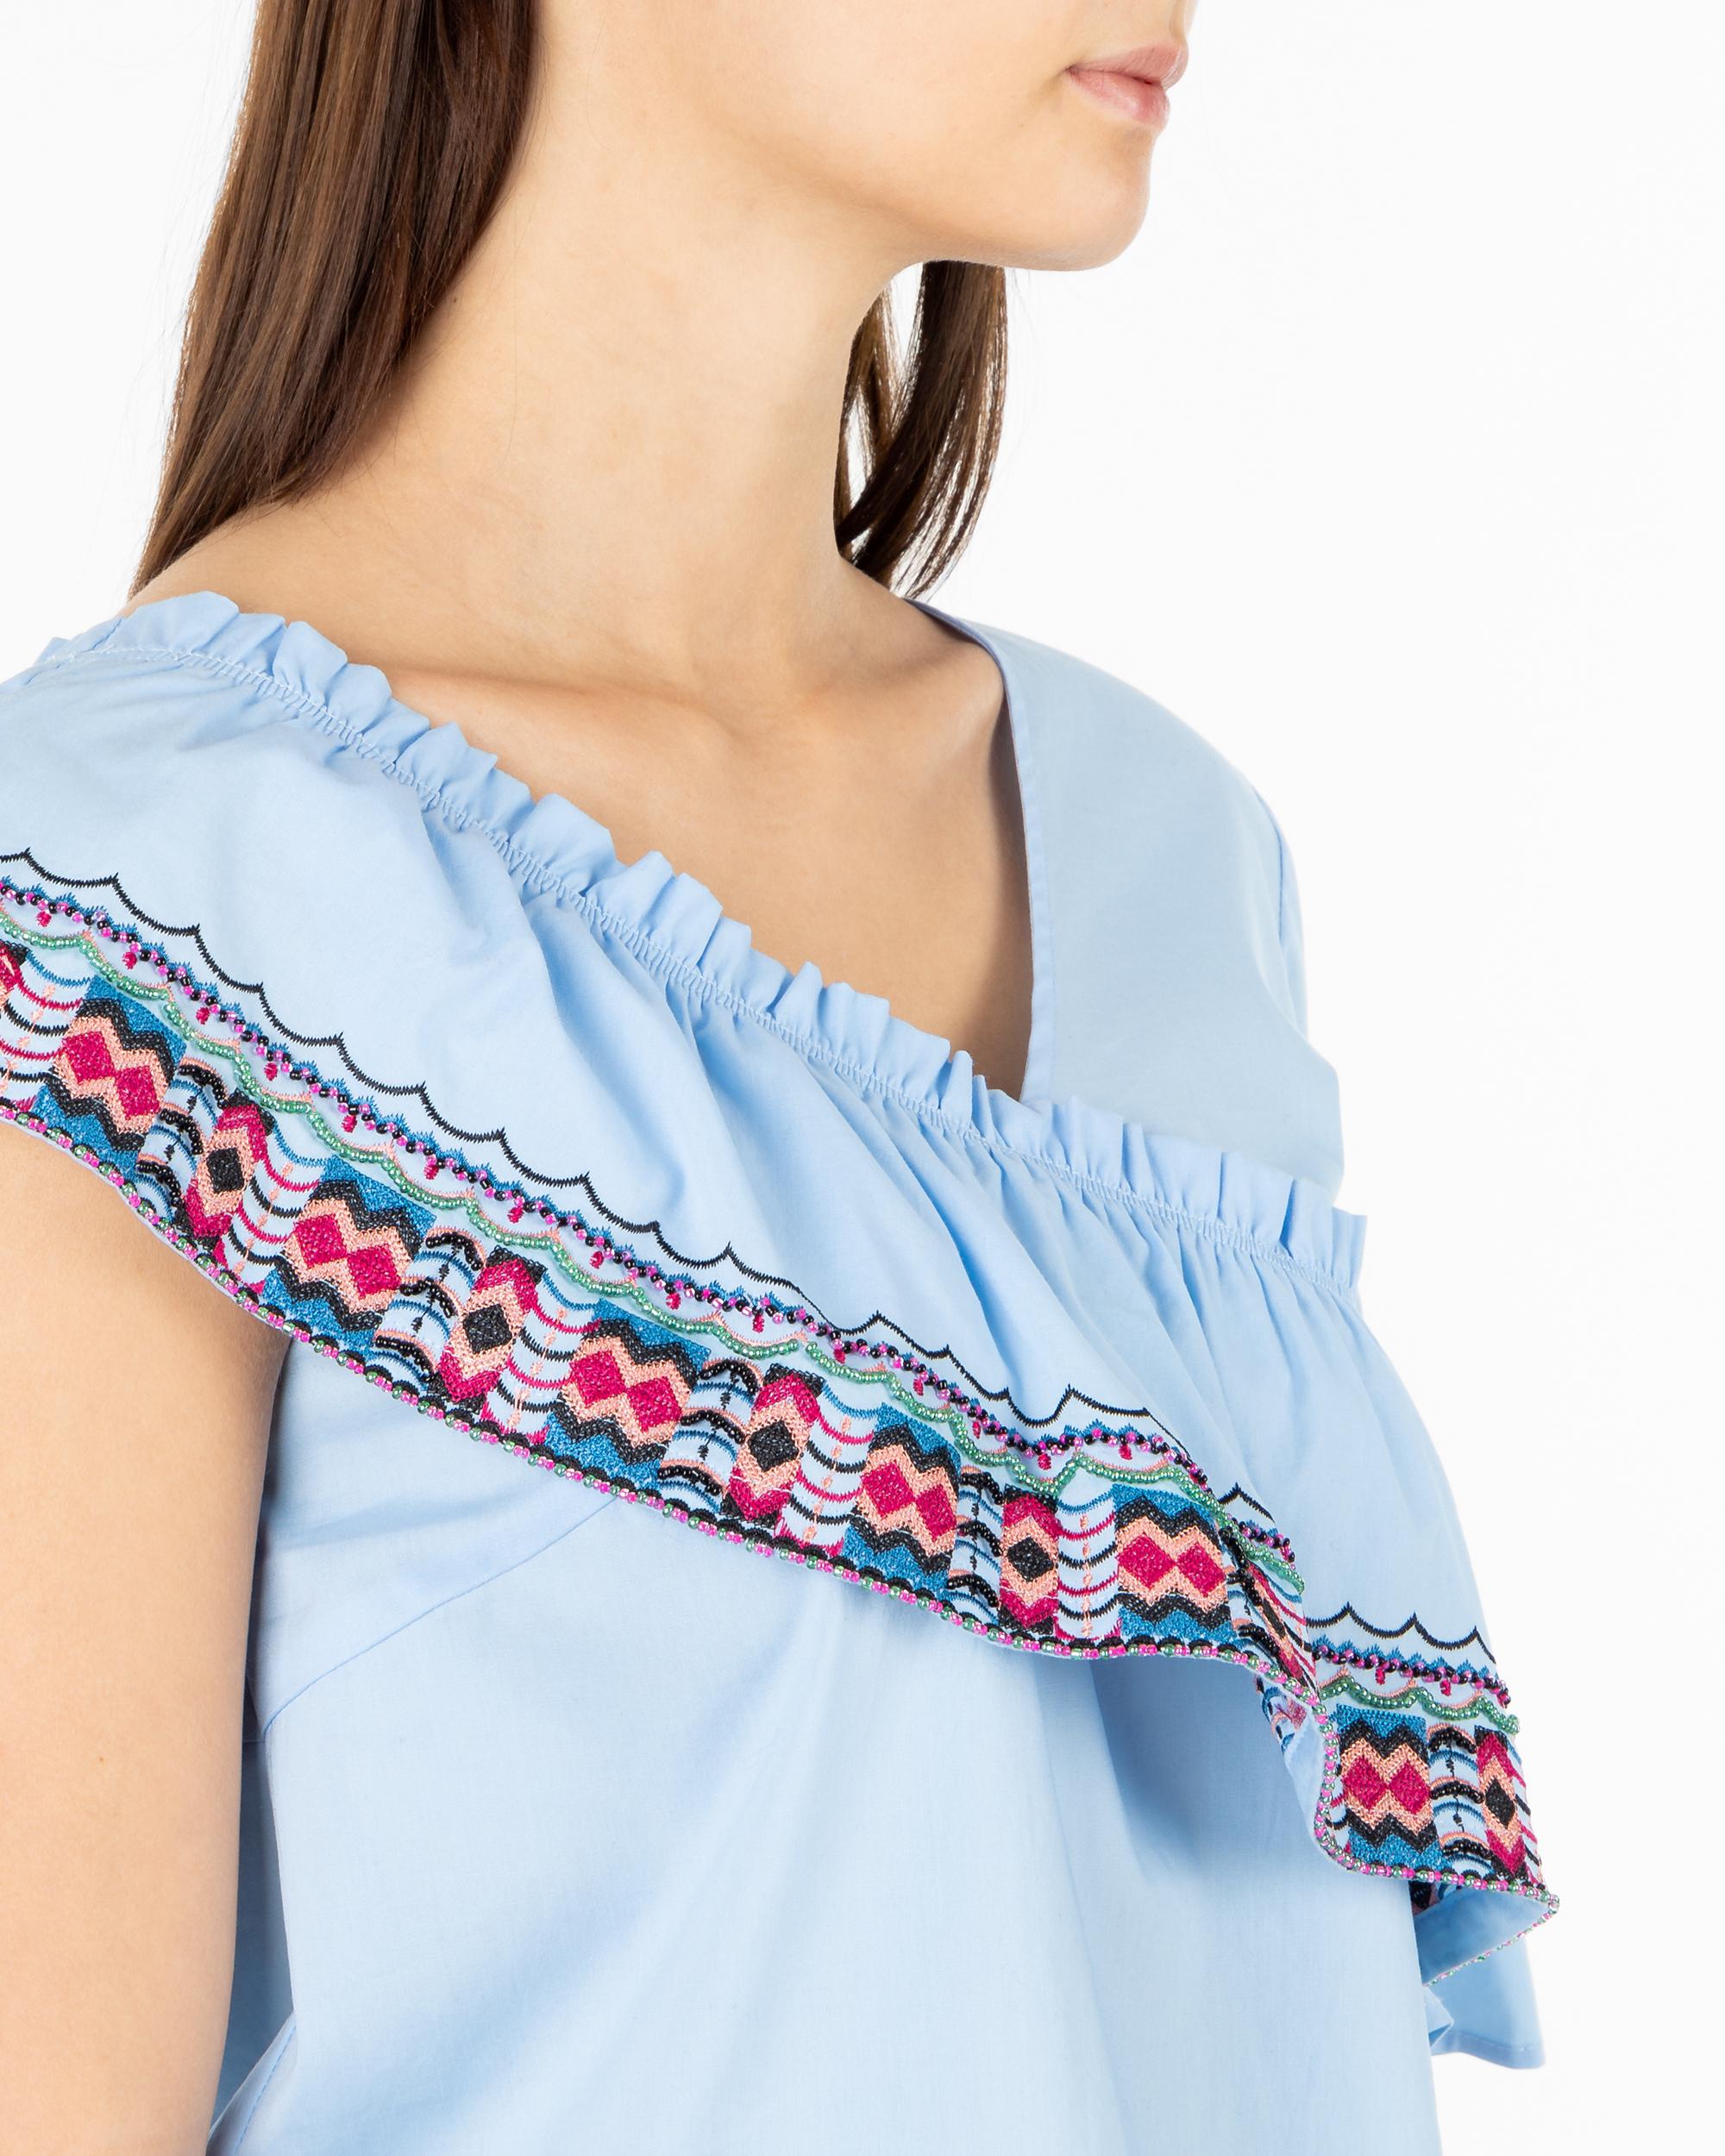 e0ec726365 Bluzka Trussardi Jeans 56C00194 1T002281 U140 niebieski - Royal Collection  - Odziez damska i męska